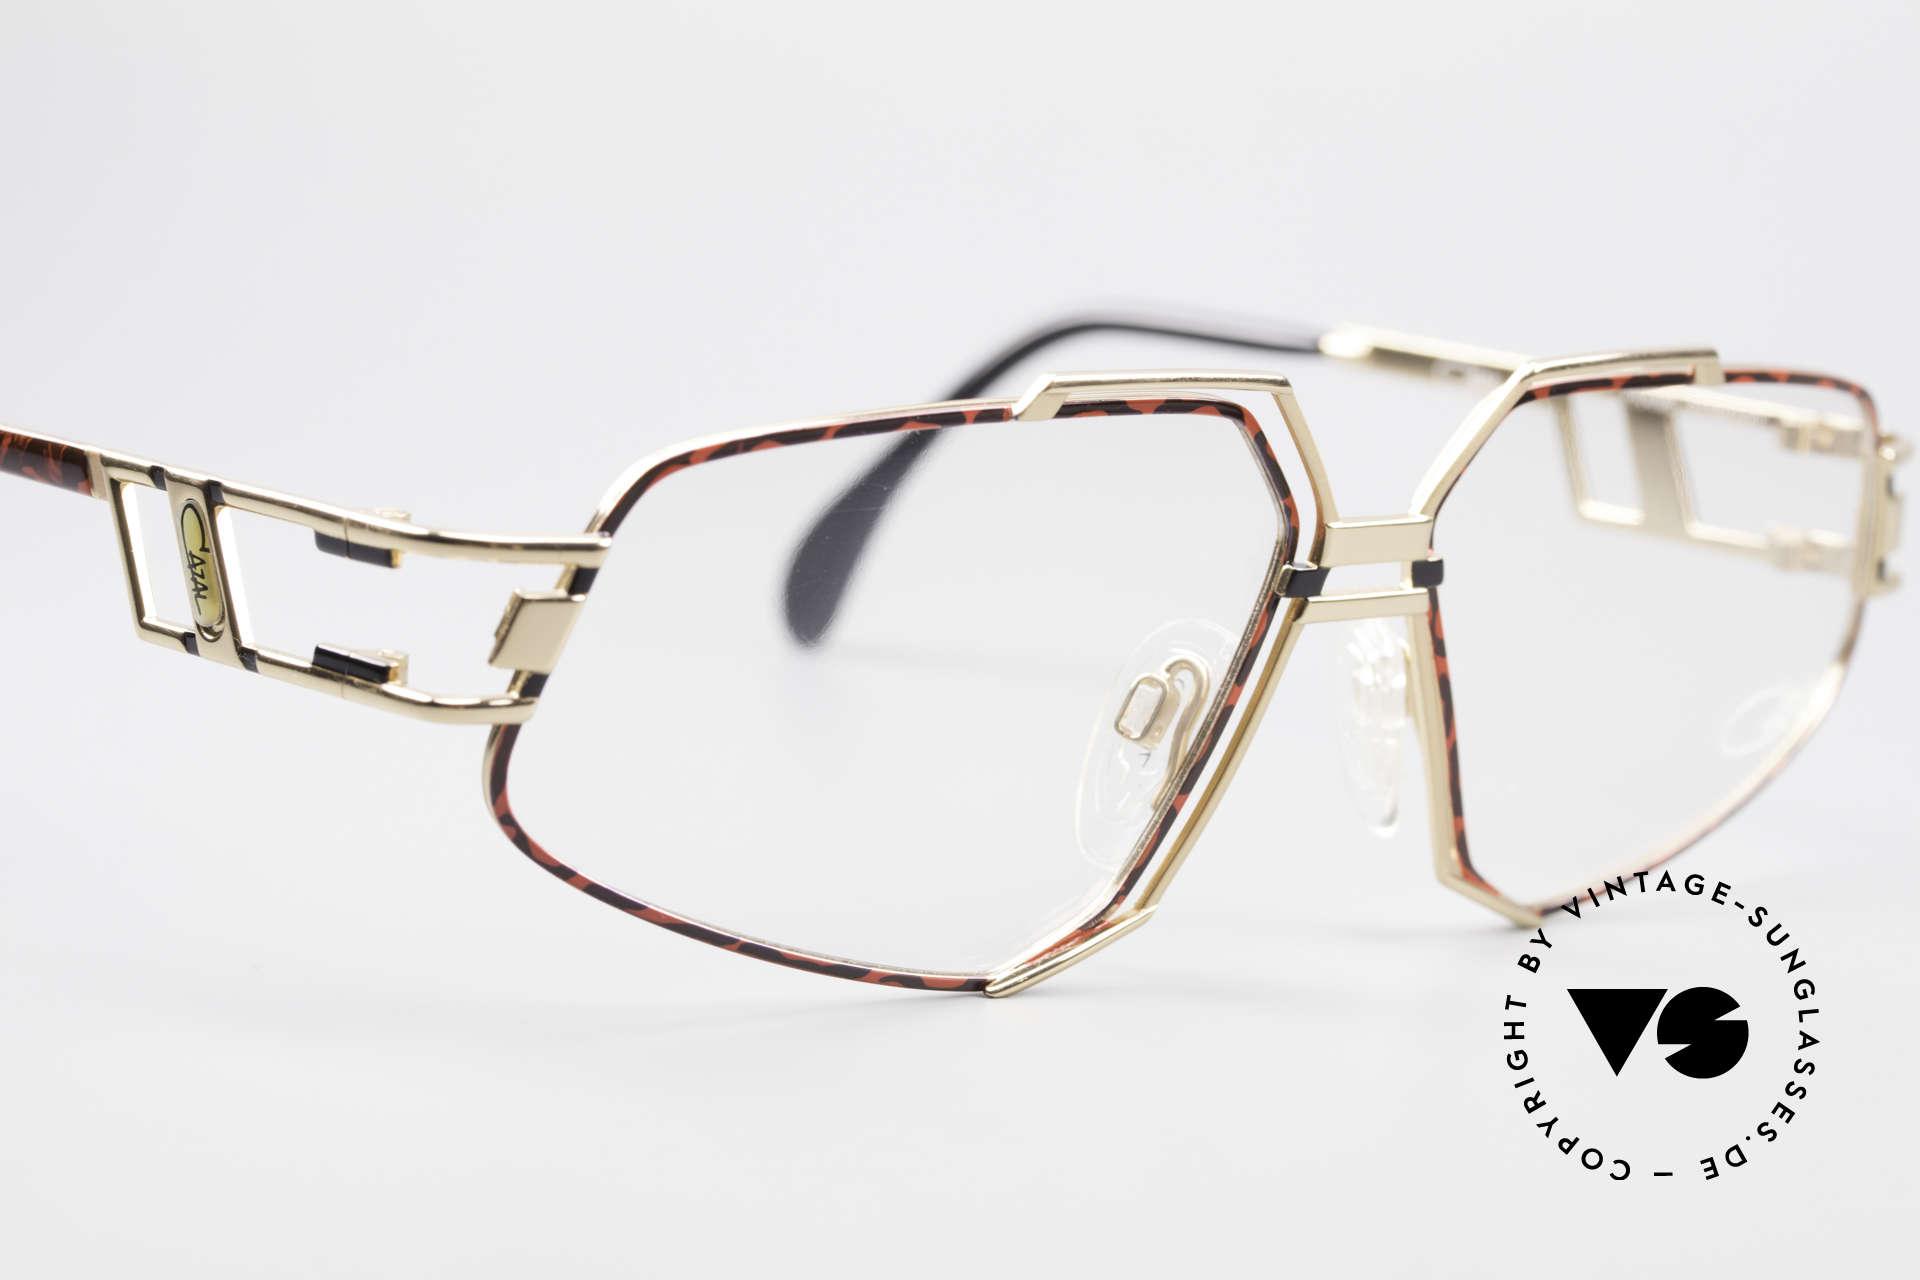 Cazal 961 Designer Vintage Eyeglasses, top ORIGINAL 90's quality (FRAME 'made in Germany'), Made for Men and Women